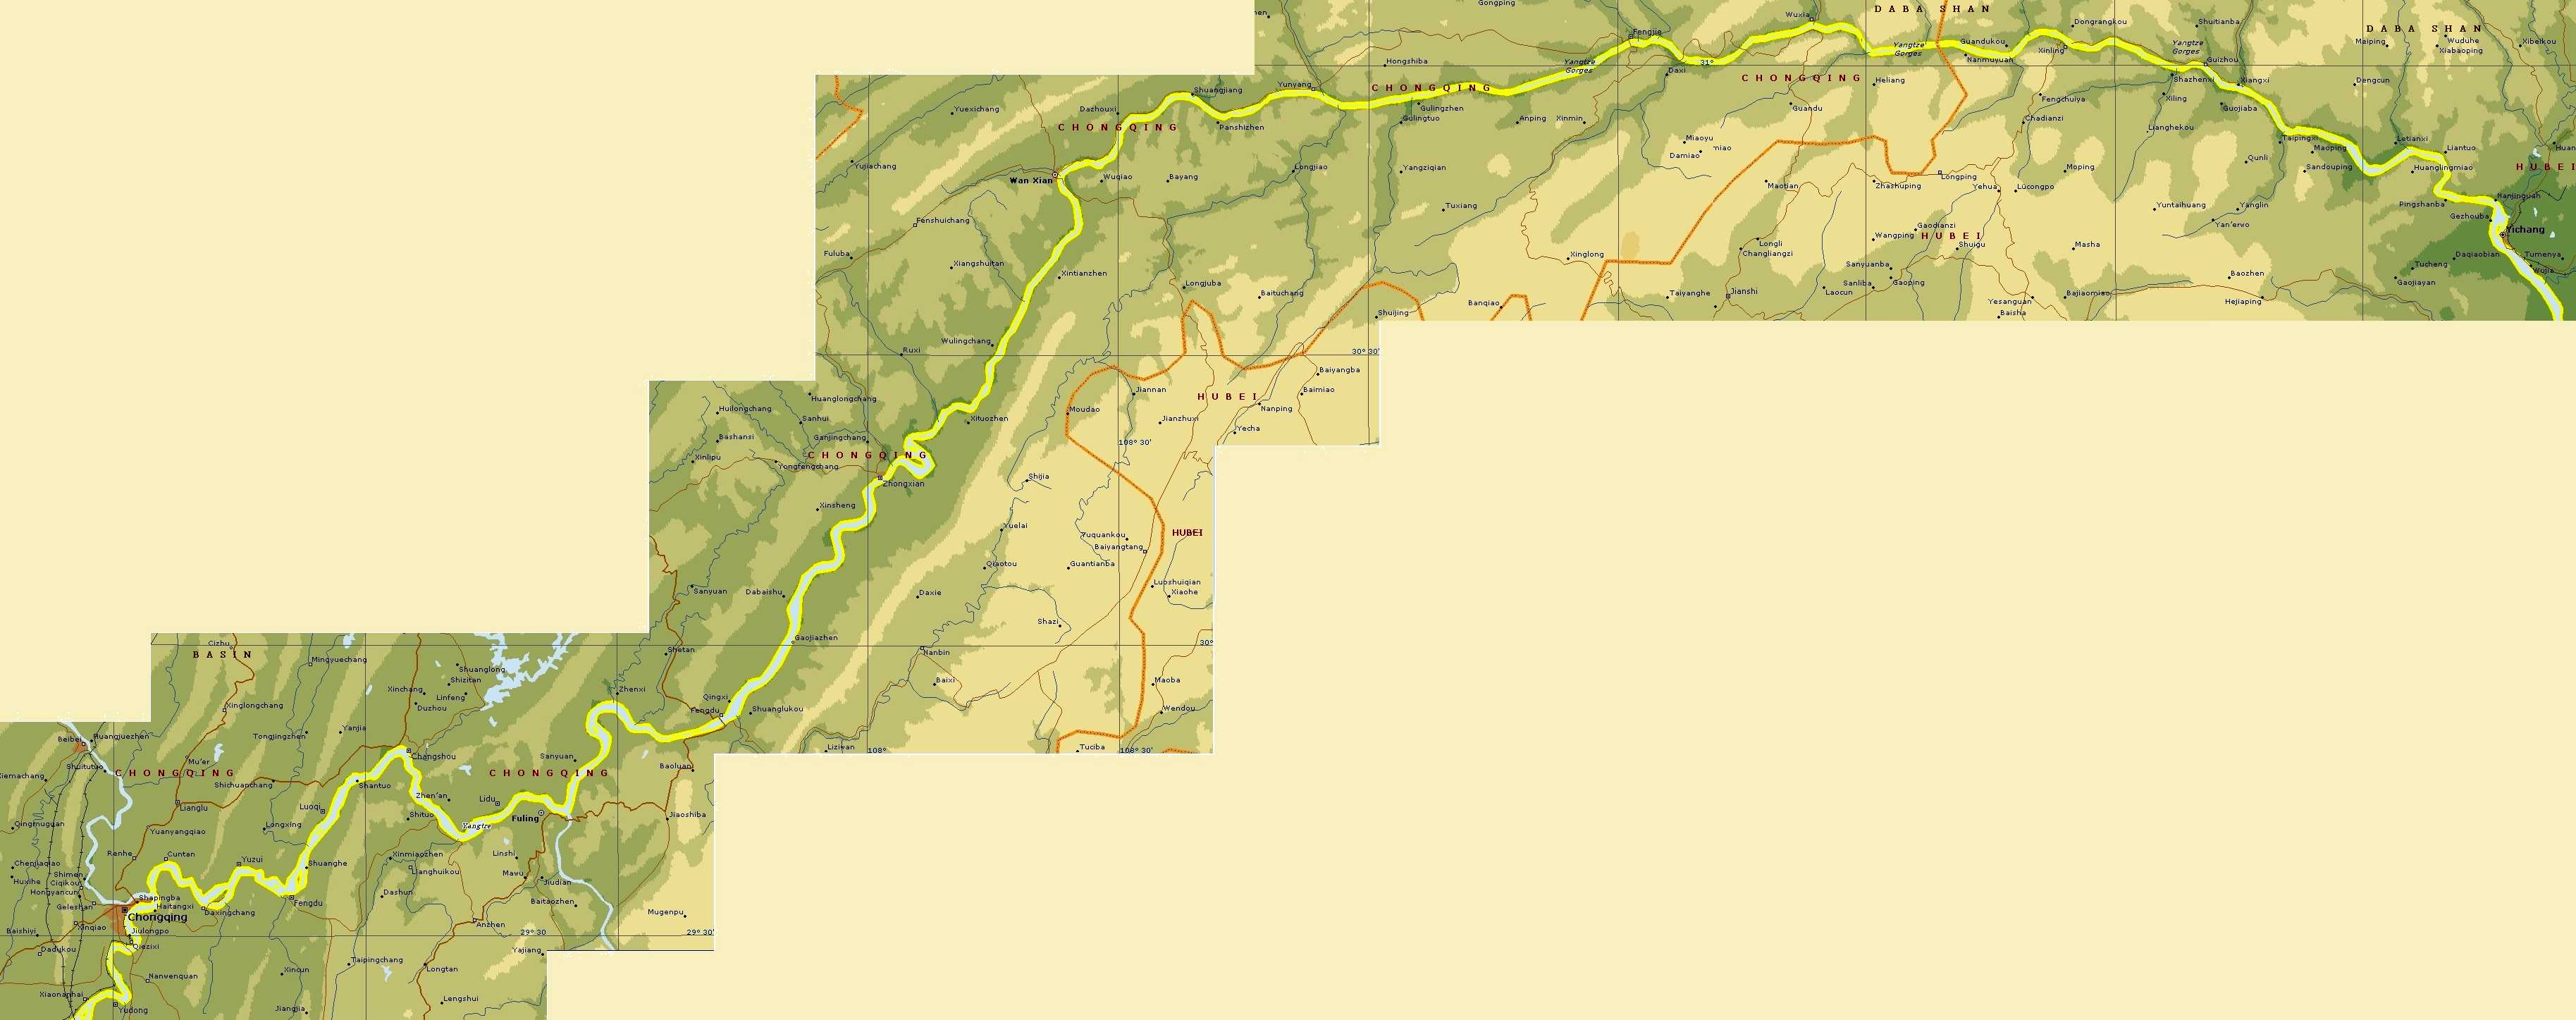 Three gorges dam map